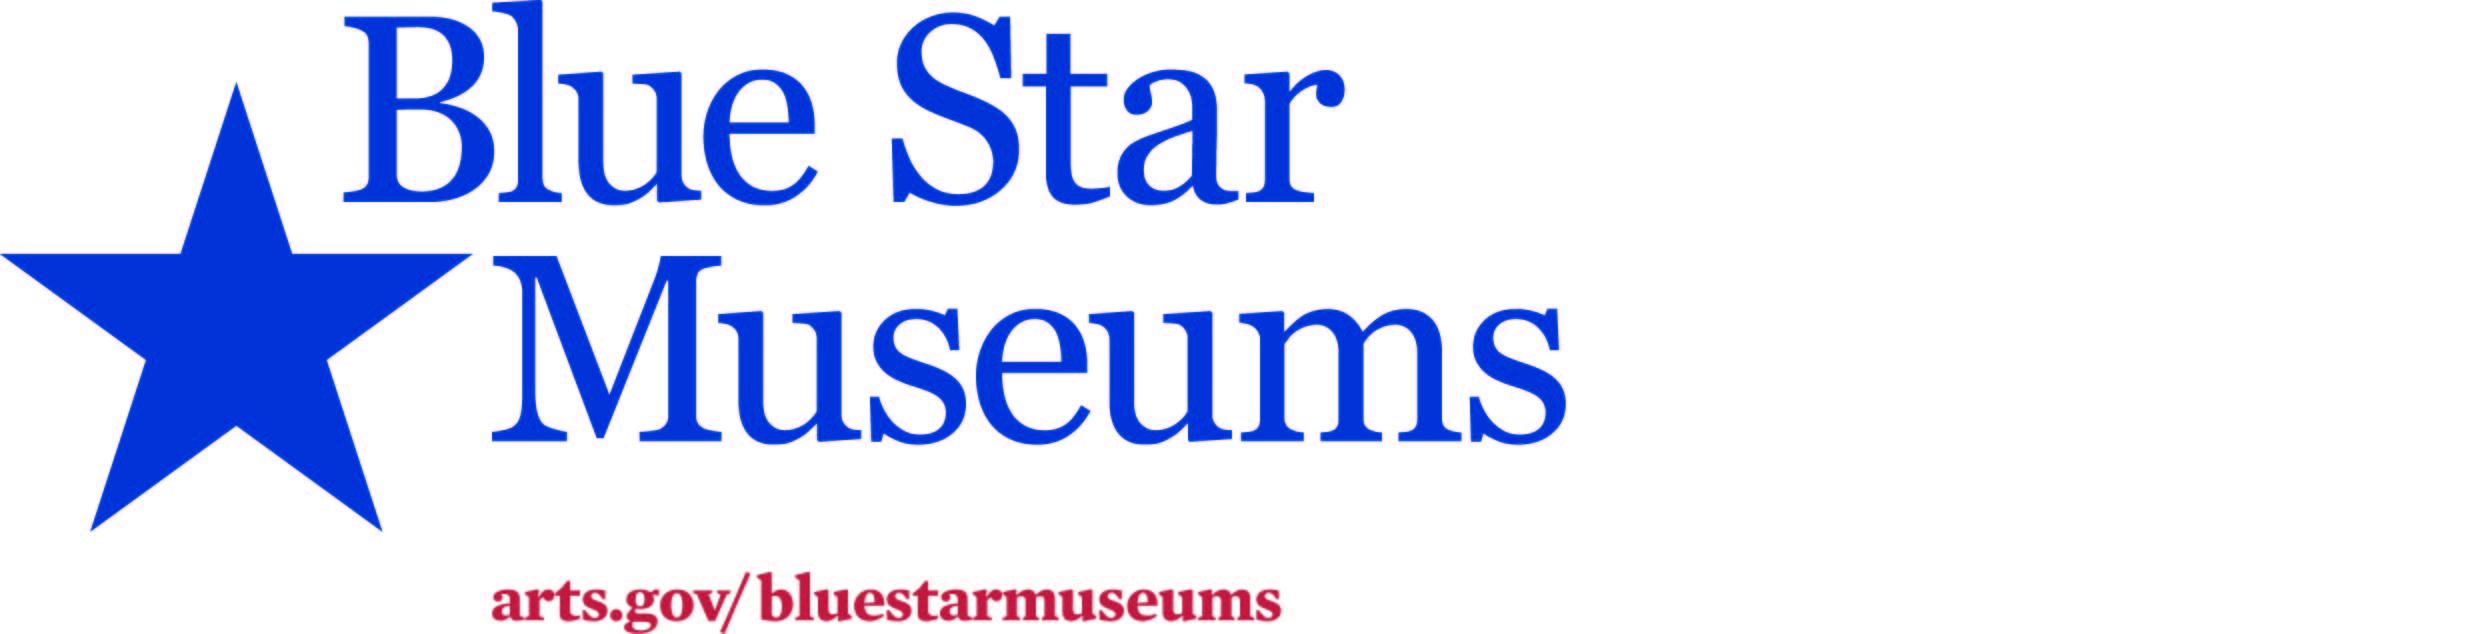 blue star museums marketing materials